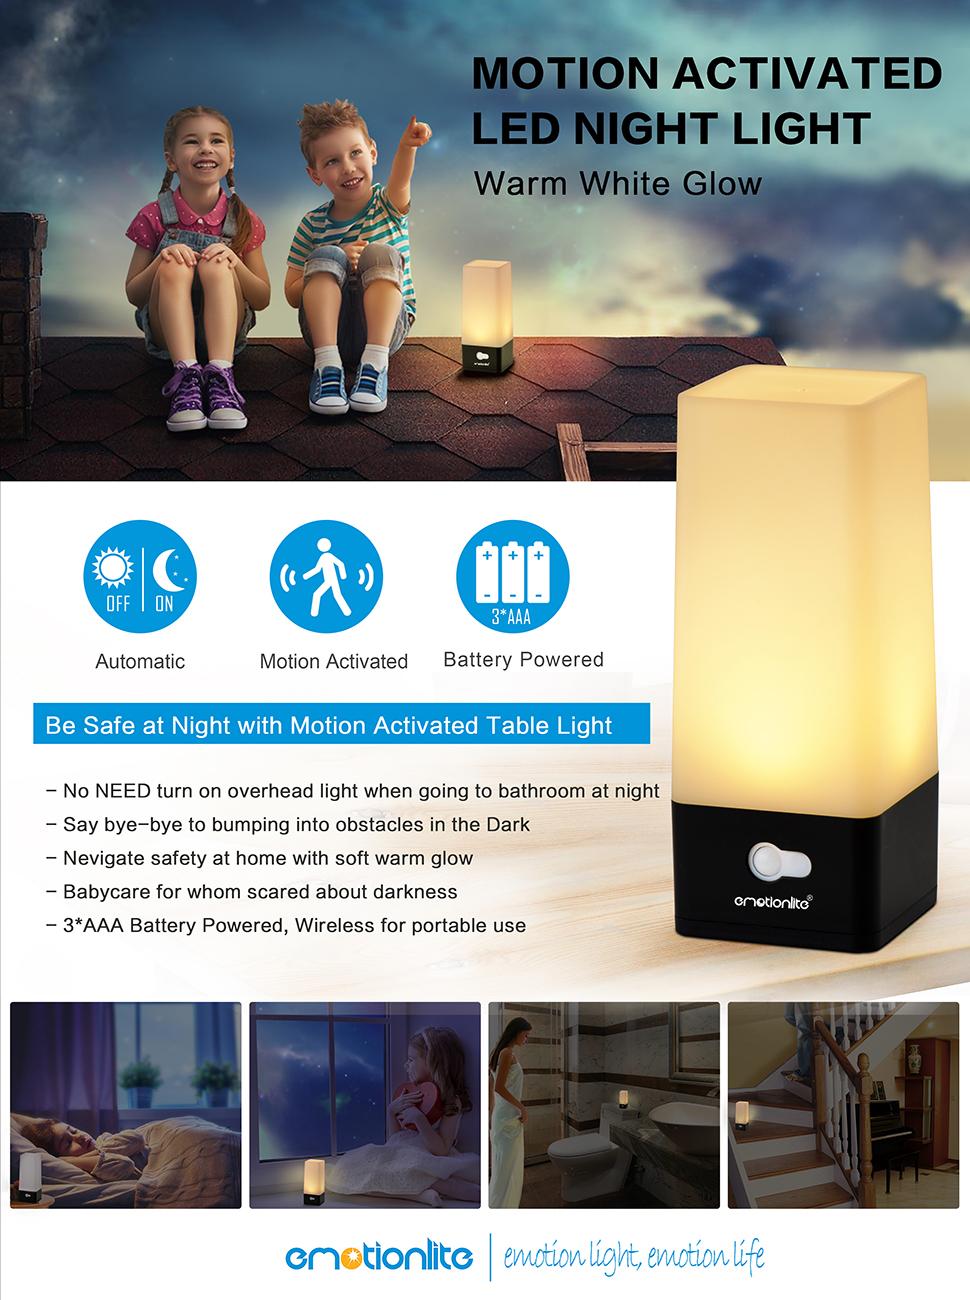 Led night light warm white - Emotionlite Wireless Pir Motion Sensor Table Lamp Led Battery Powered Hallway Night Light